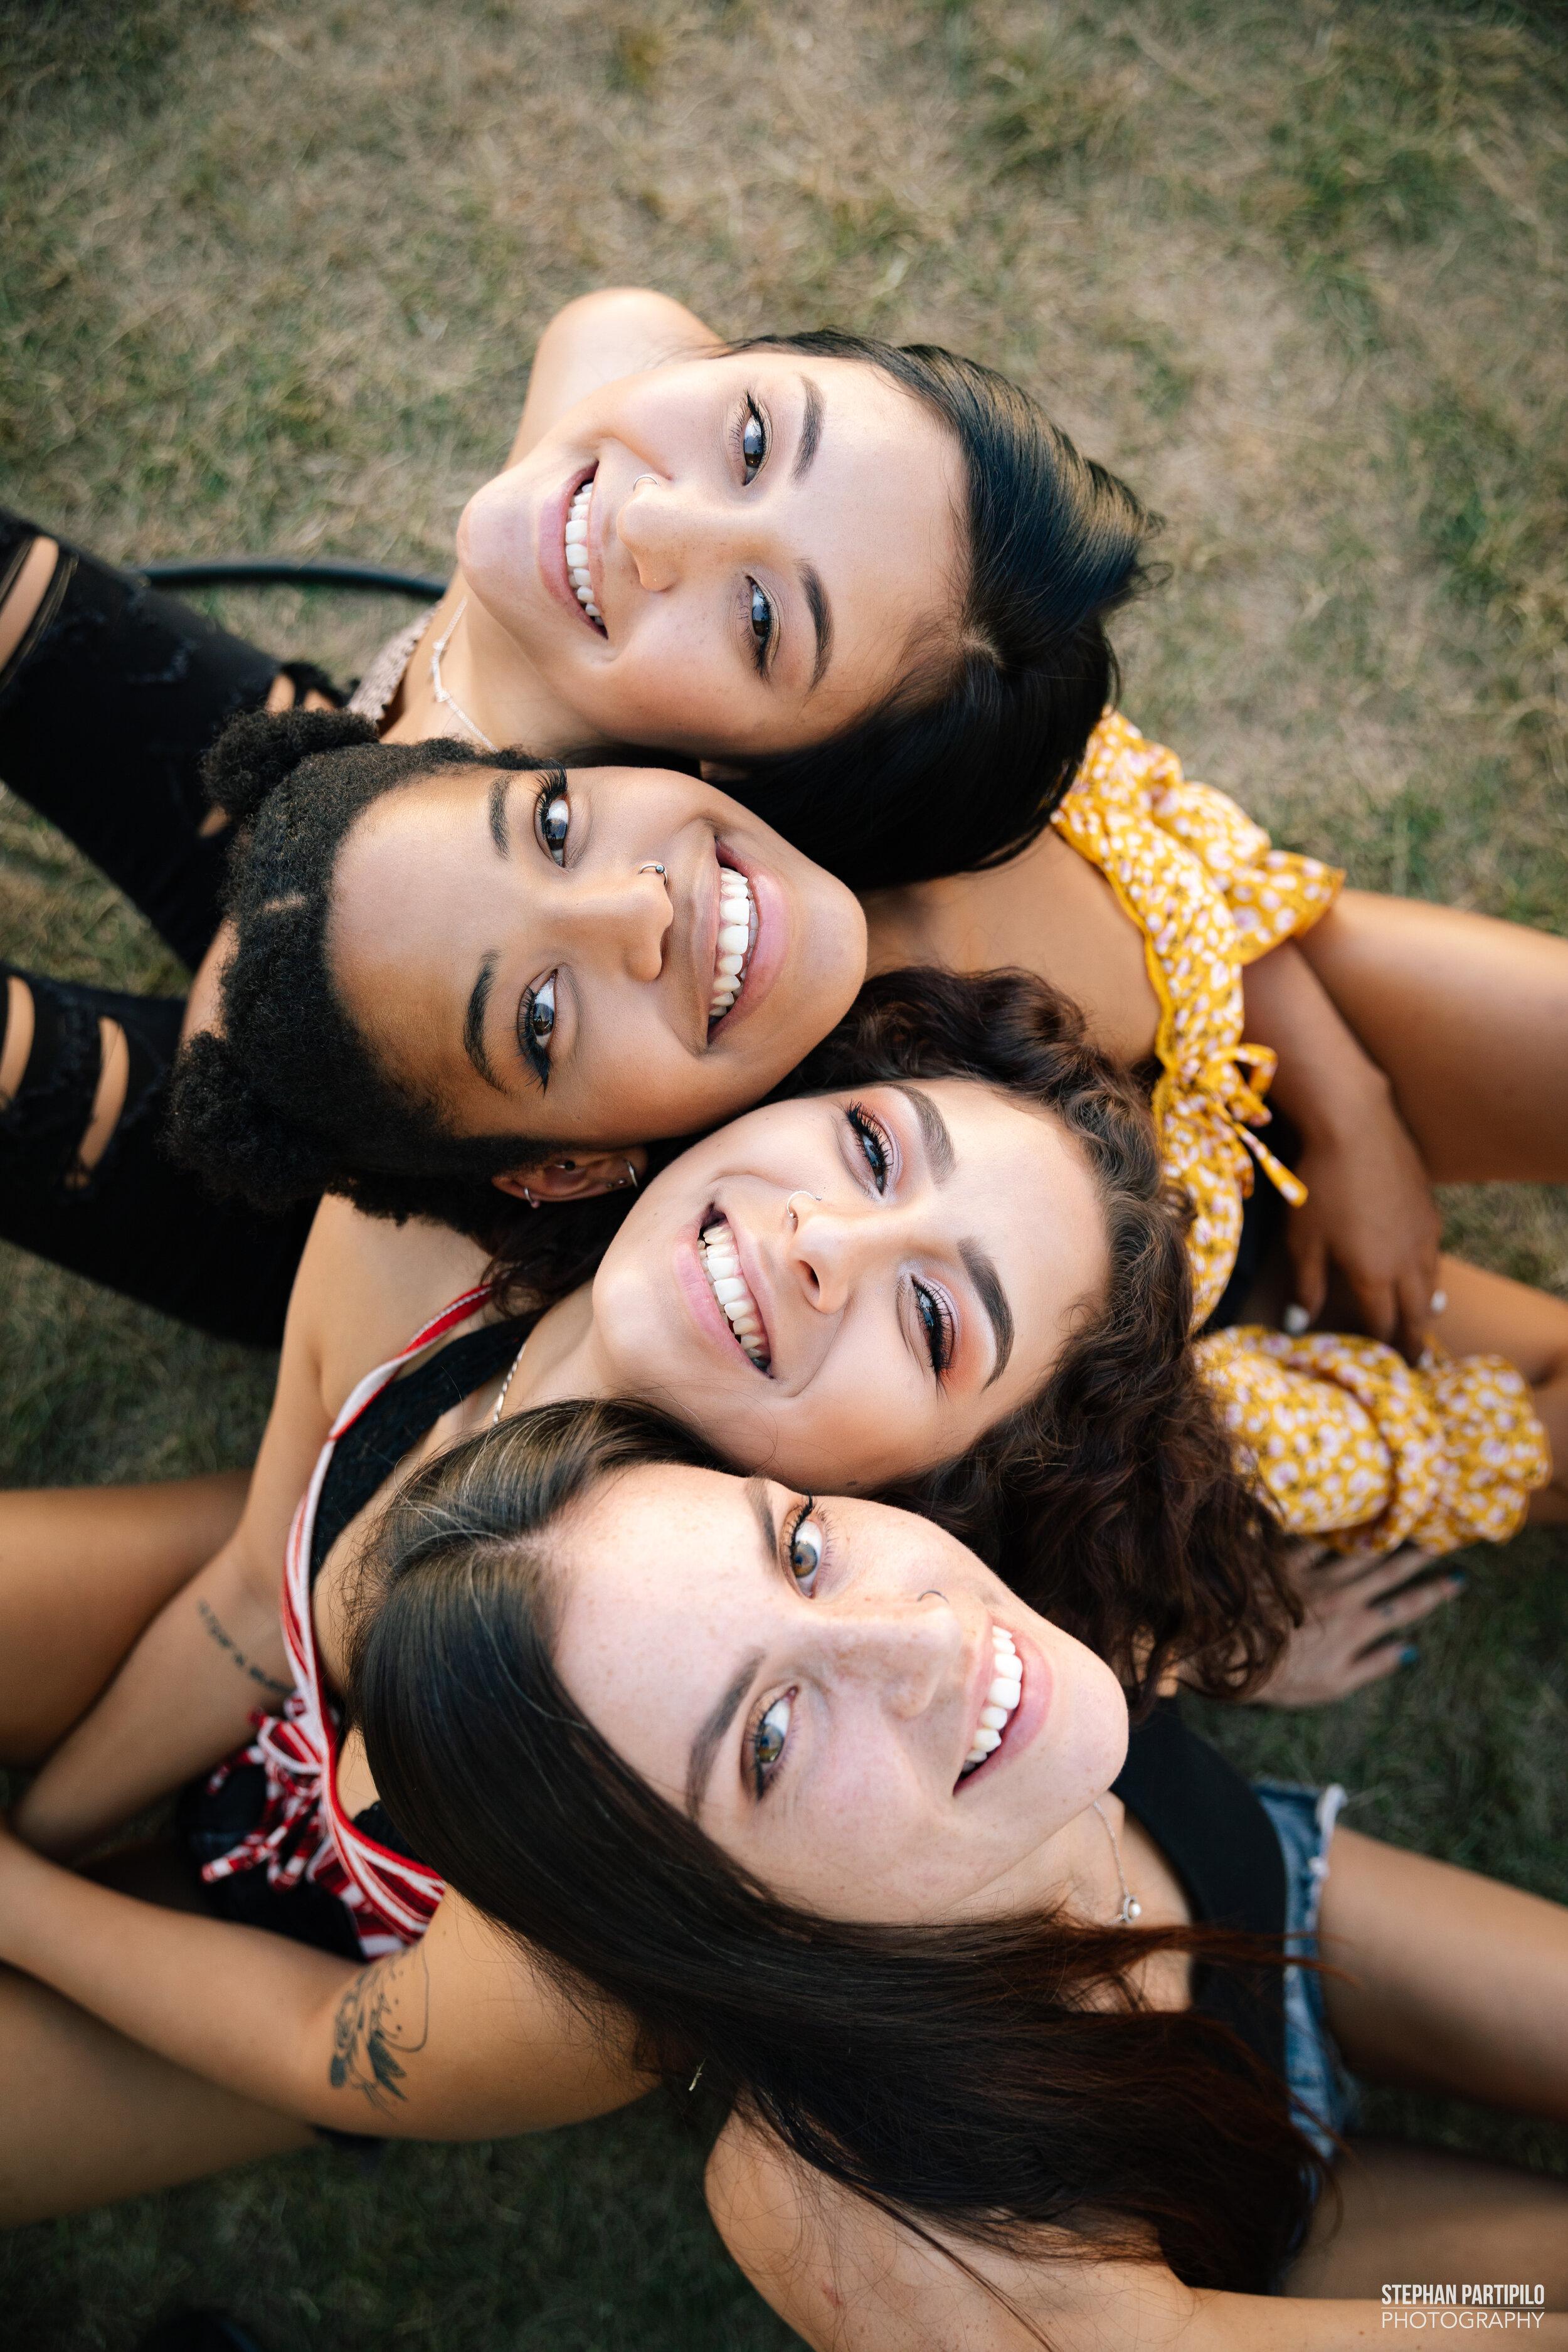 Nayeli & Friends Oregon State Fair SP Selects  0G5A4473.jpg